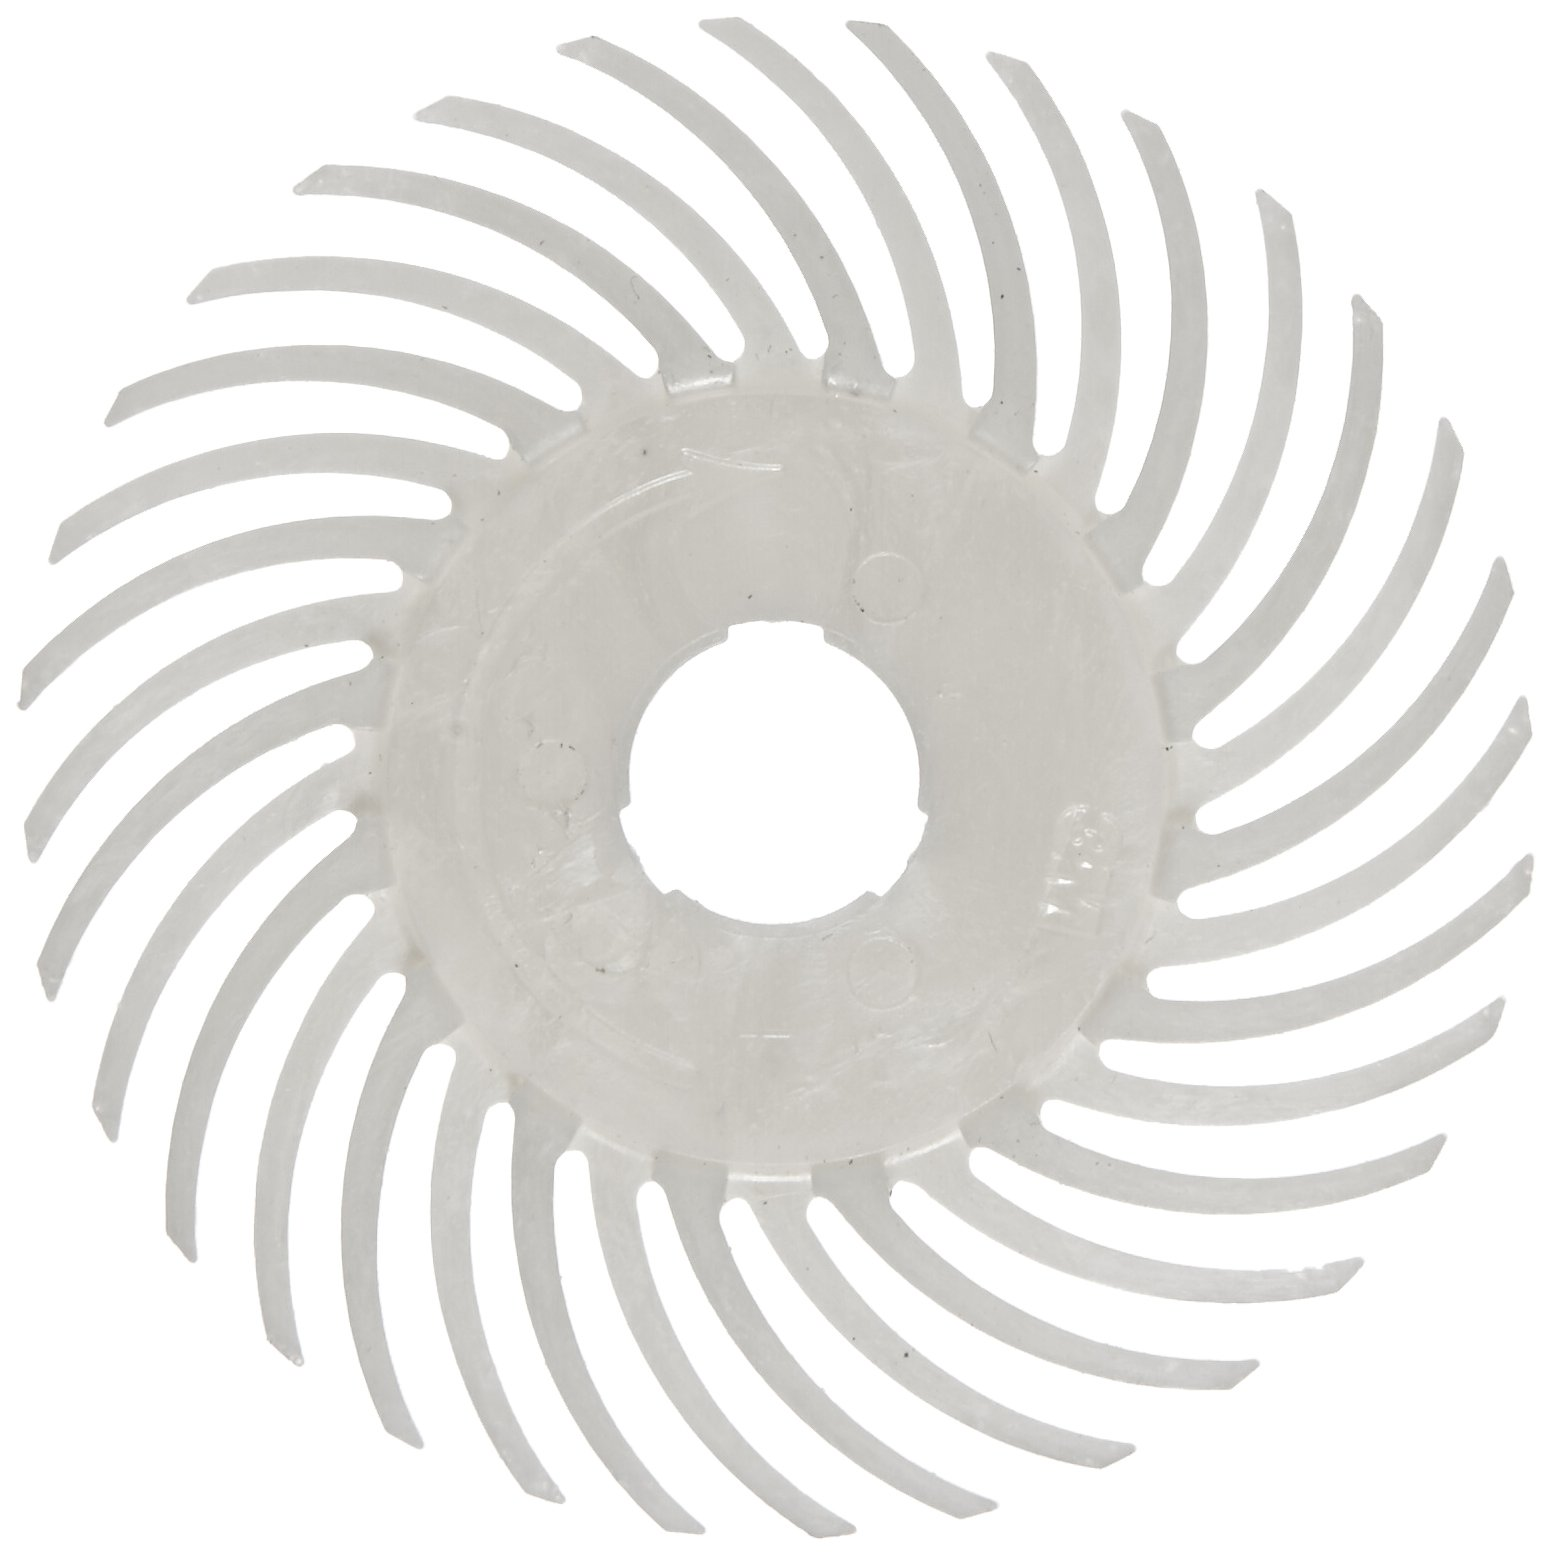 Scotch-Brite(TM) SR Radial Bristle Disc, 20000 rpm, 2 Diameter, Cream (Pack of 10)